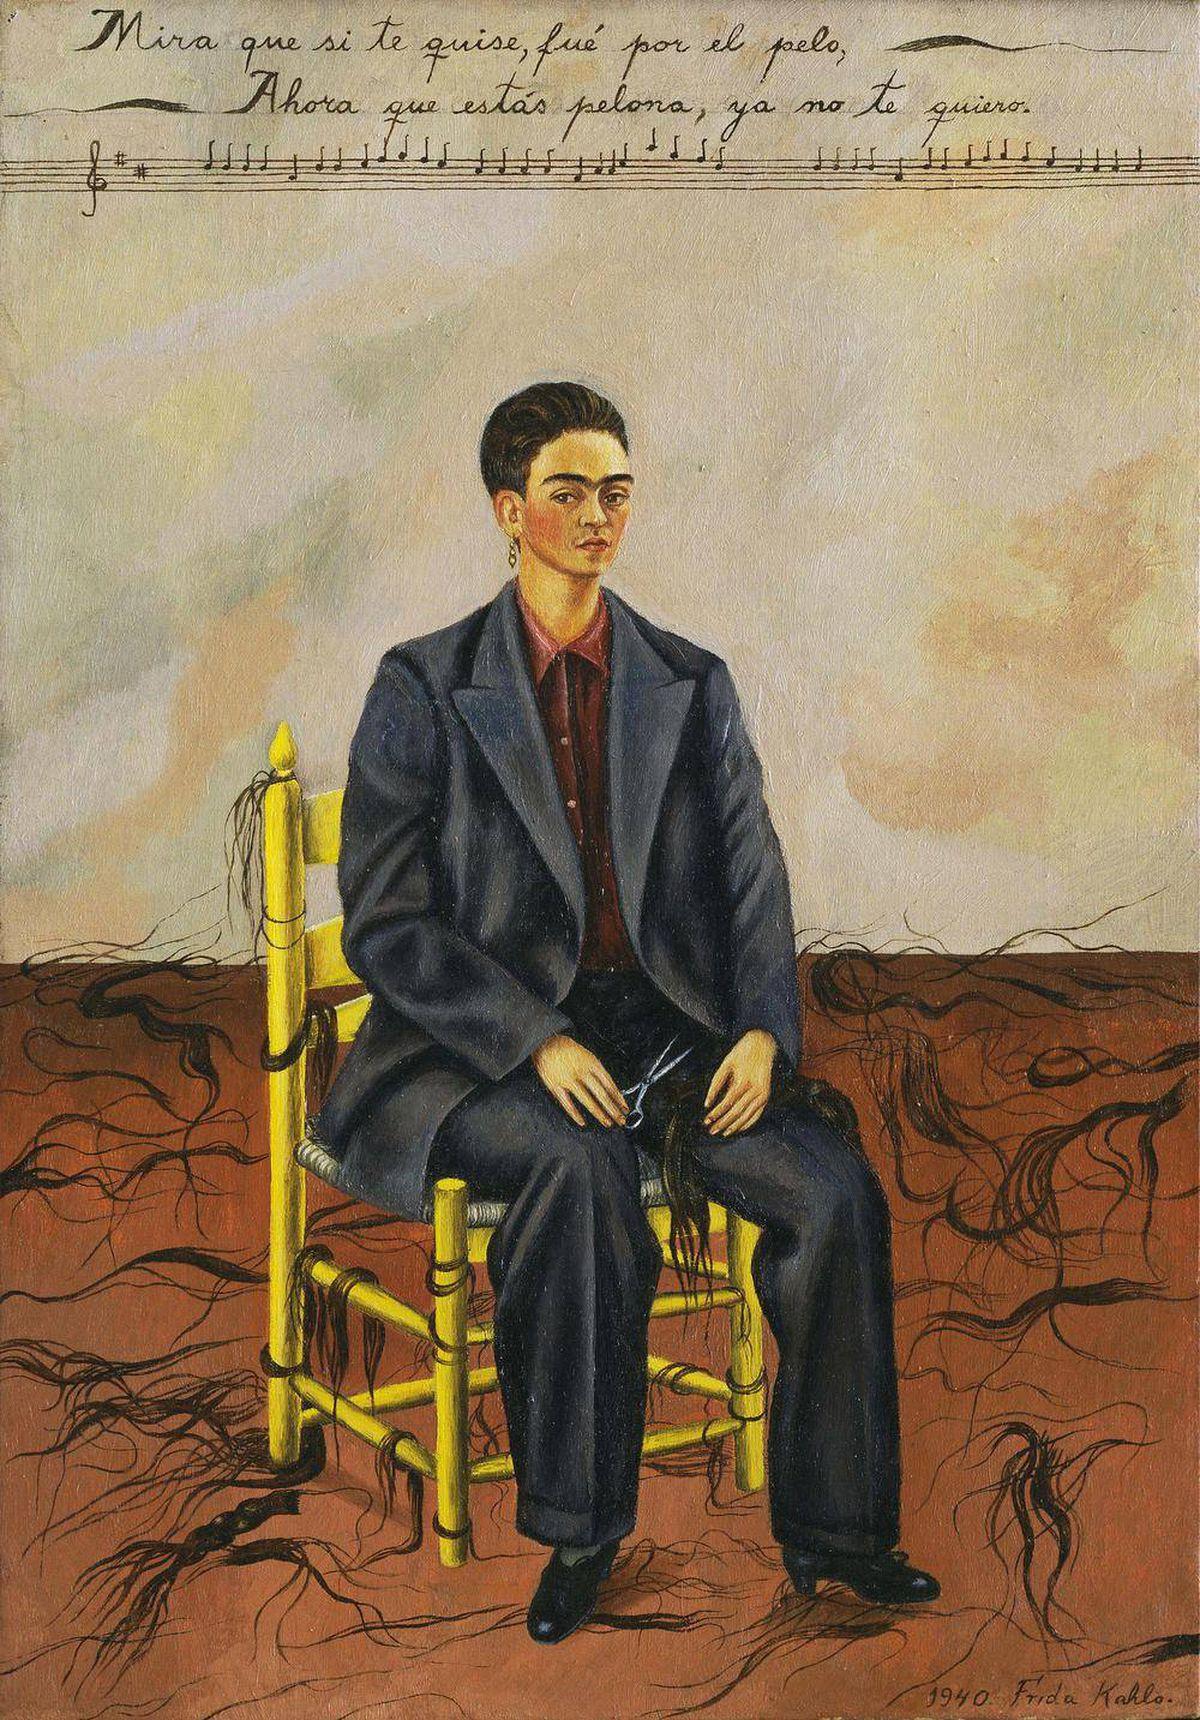 Collection Museum of Modern Art, New York (C) Banco de México Diego Rivera & Frida Kahlo Museums Trust, Mexico, D.F. /Artists R